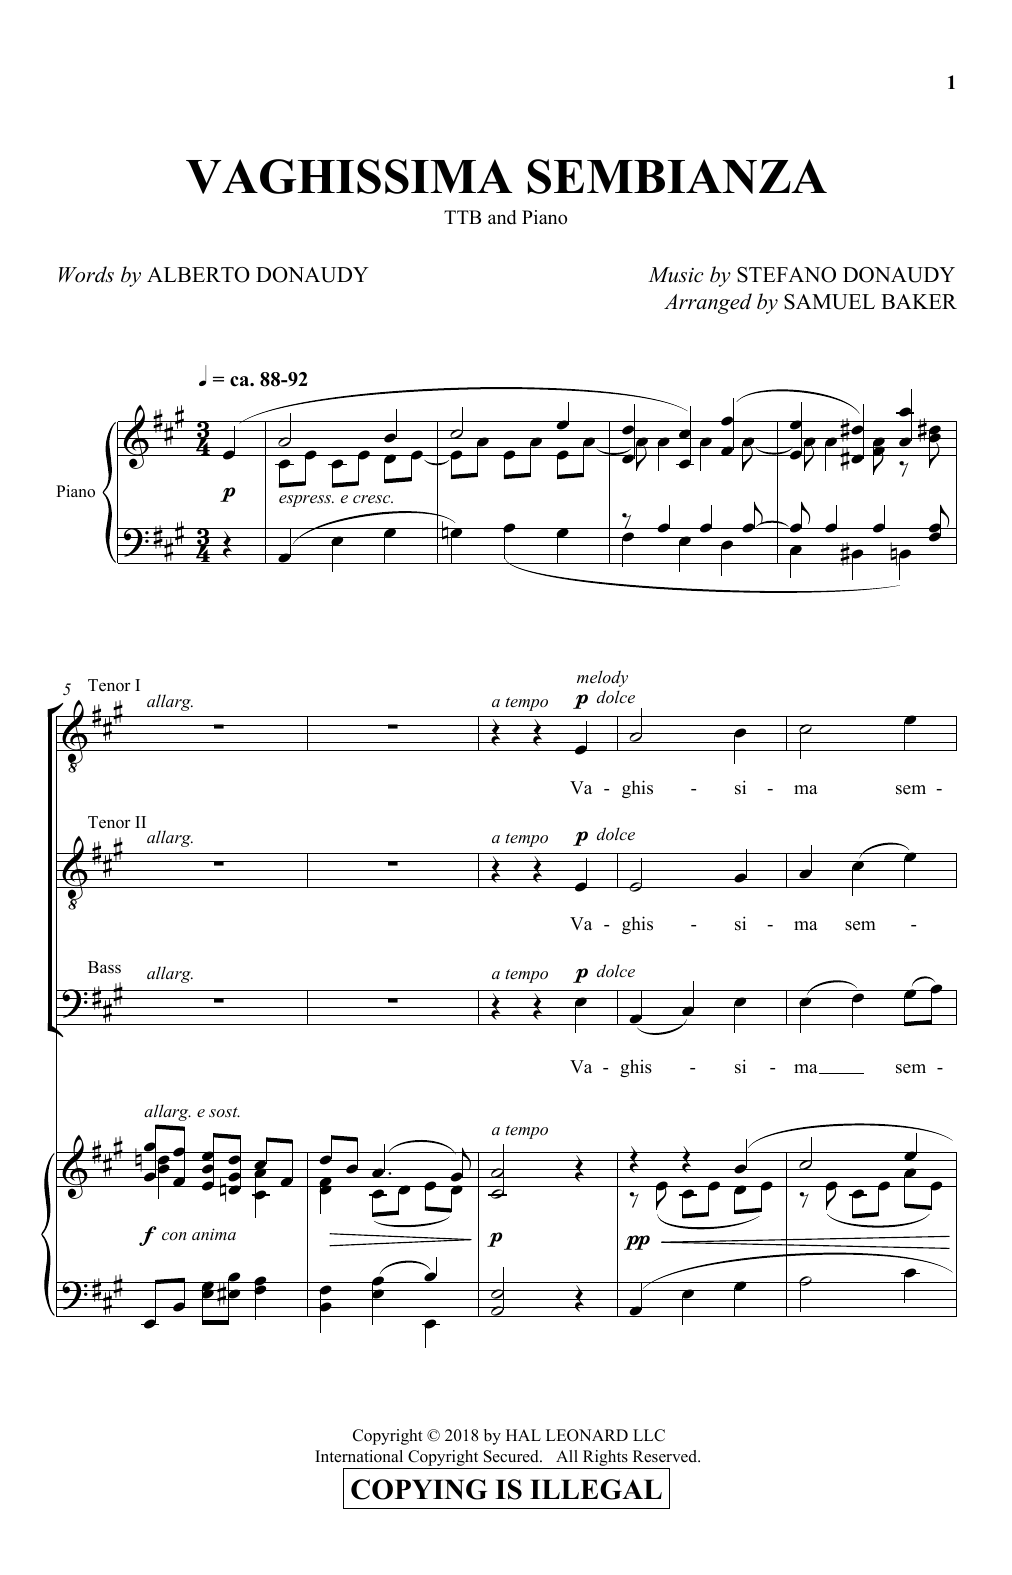 Vaghissima Sembianza (arr. Samuel Baker) (TTBB Choir)